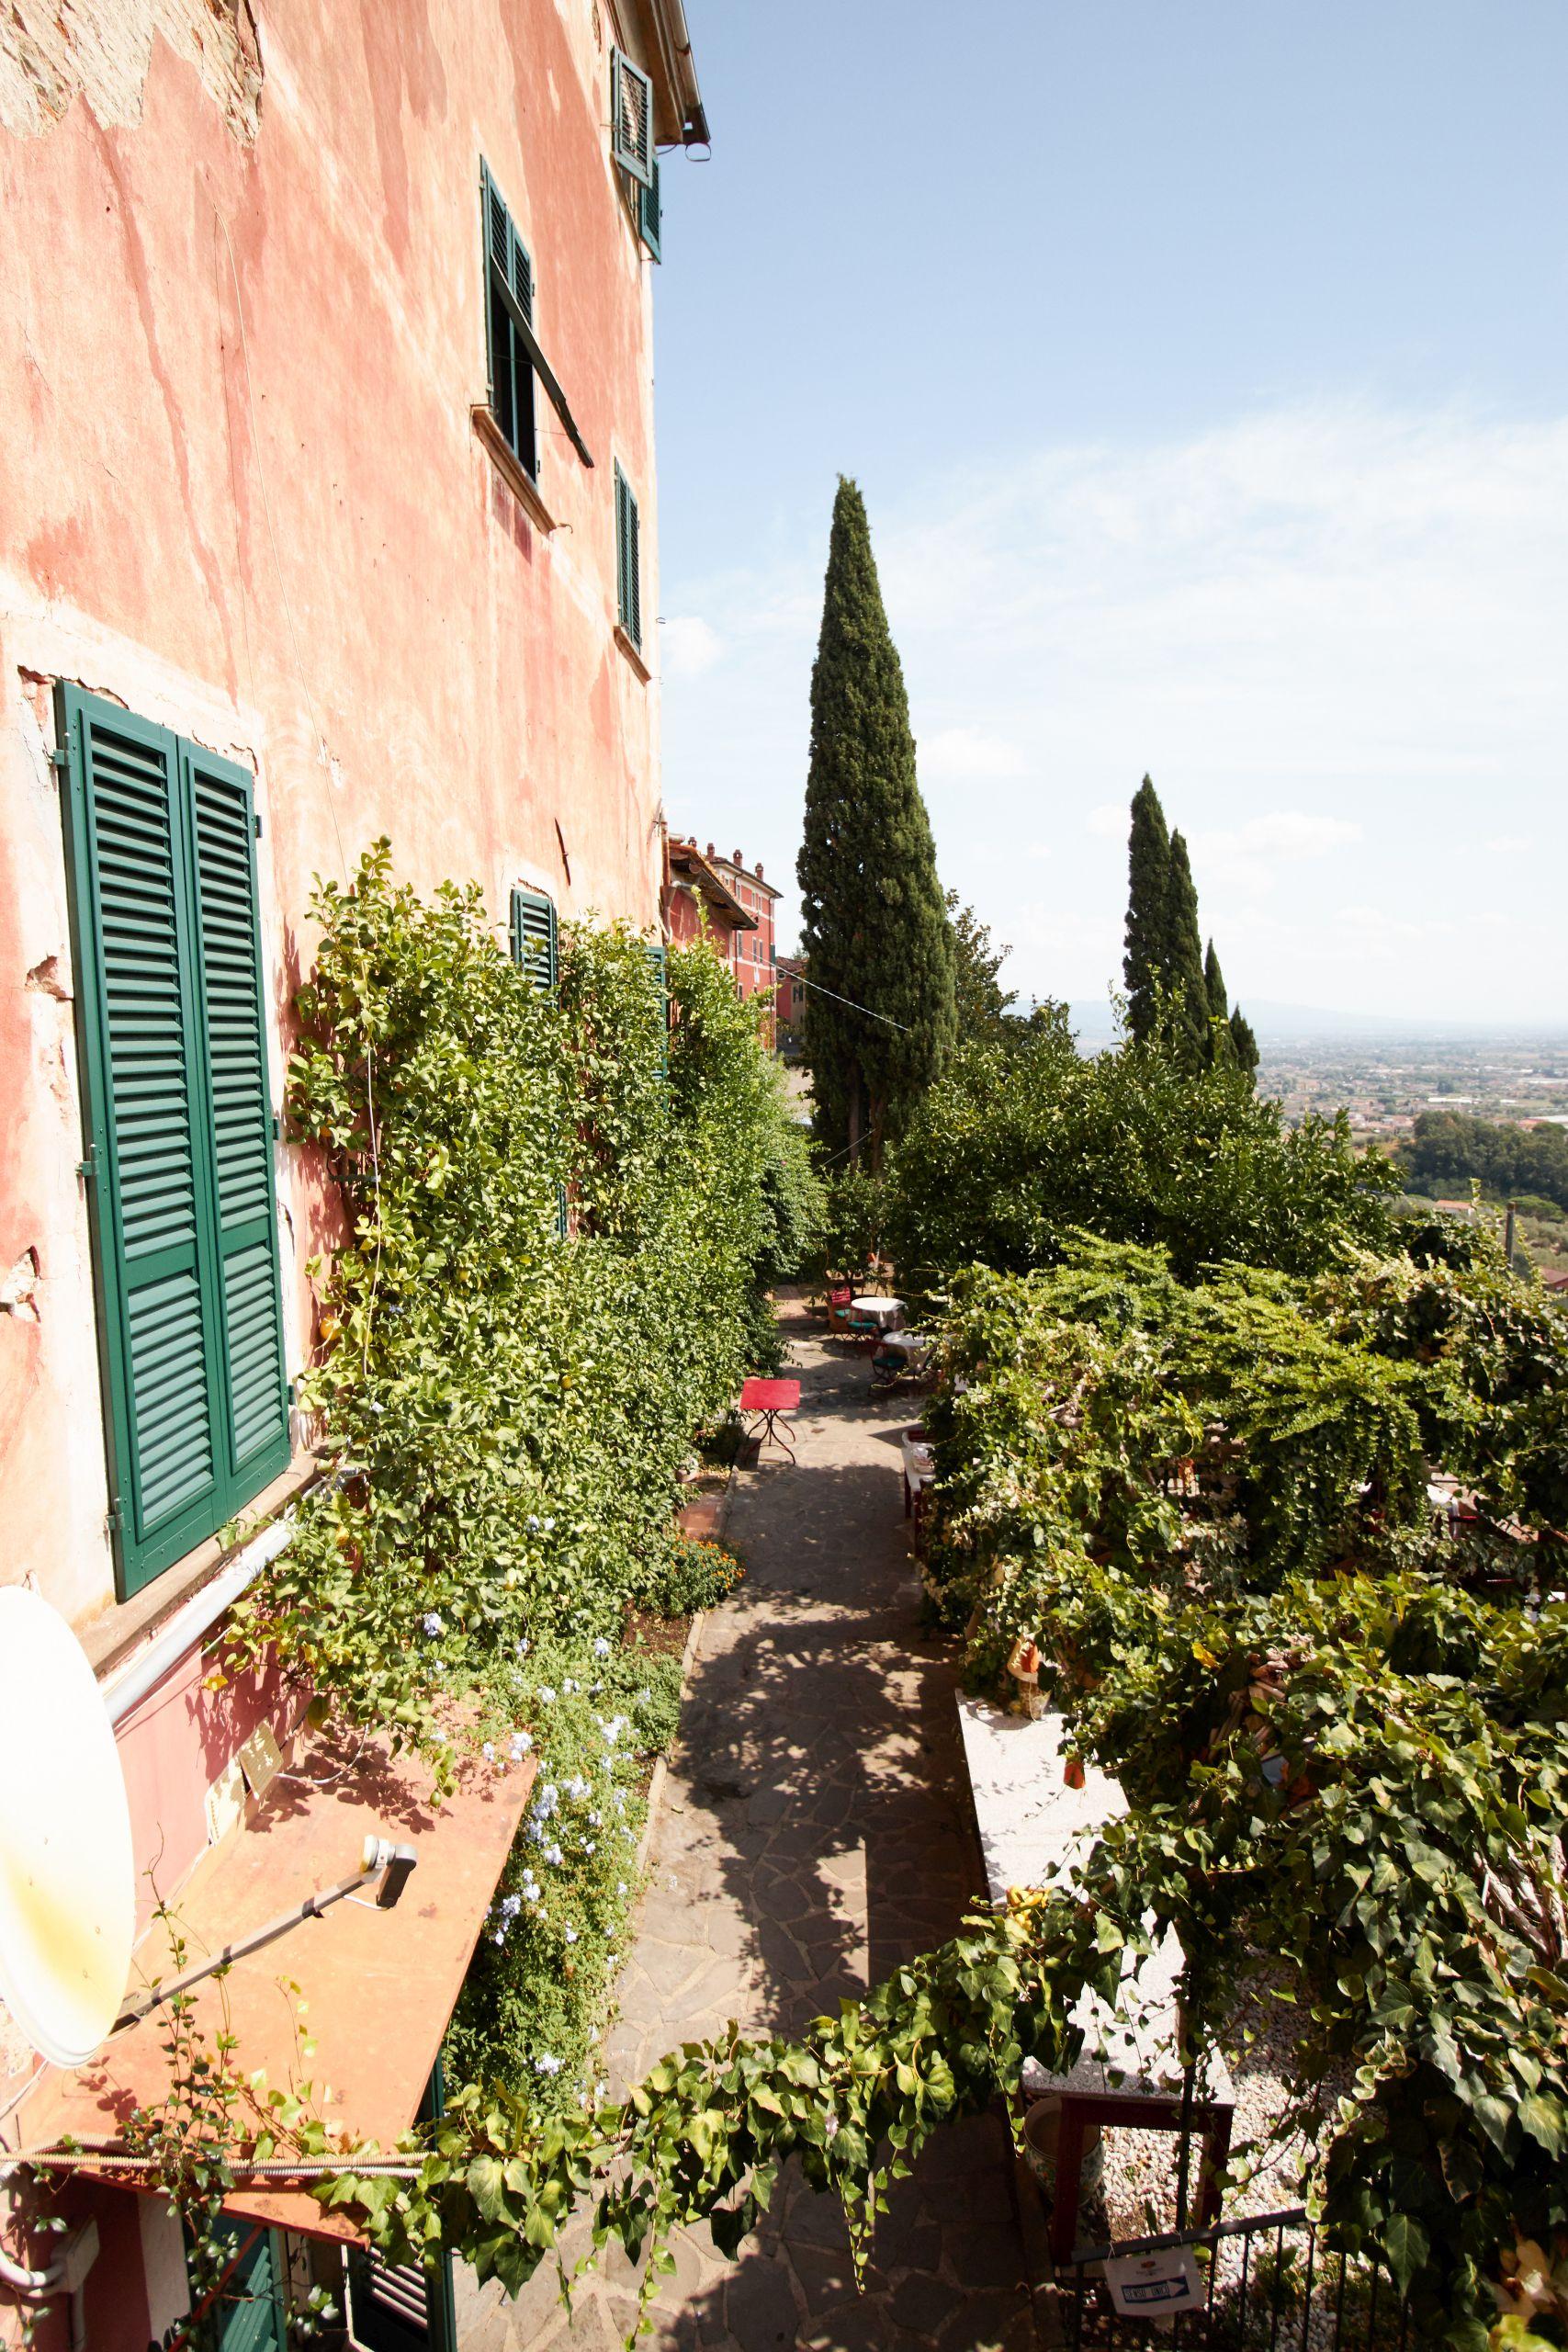 Villa Sermolli als Stop vom Toskana Roadtrip